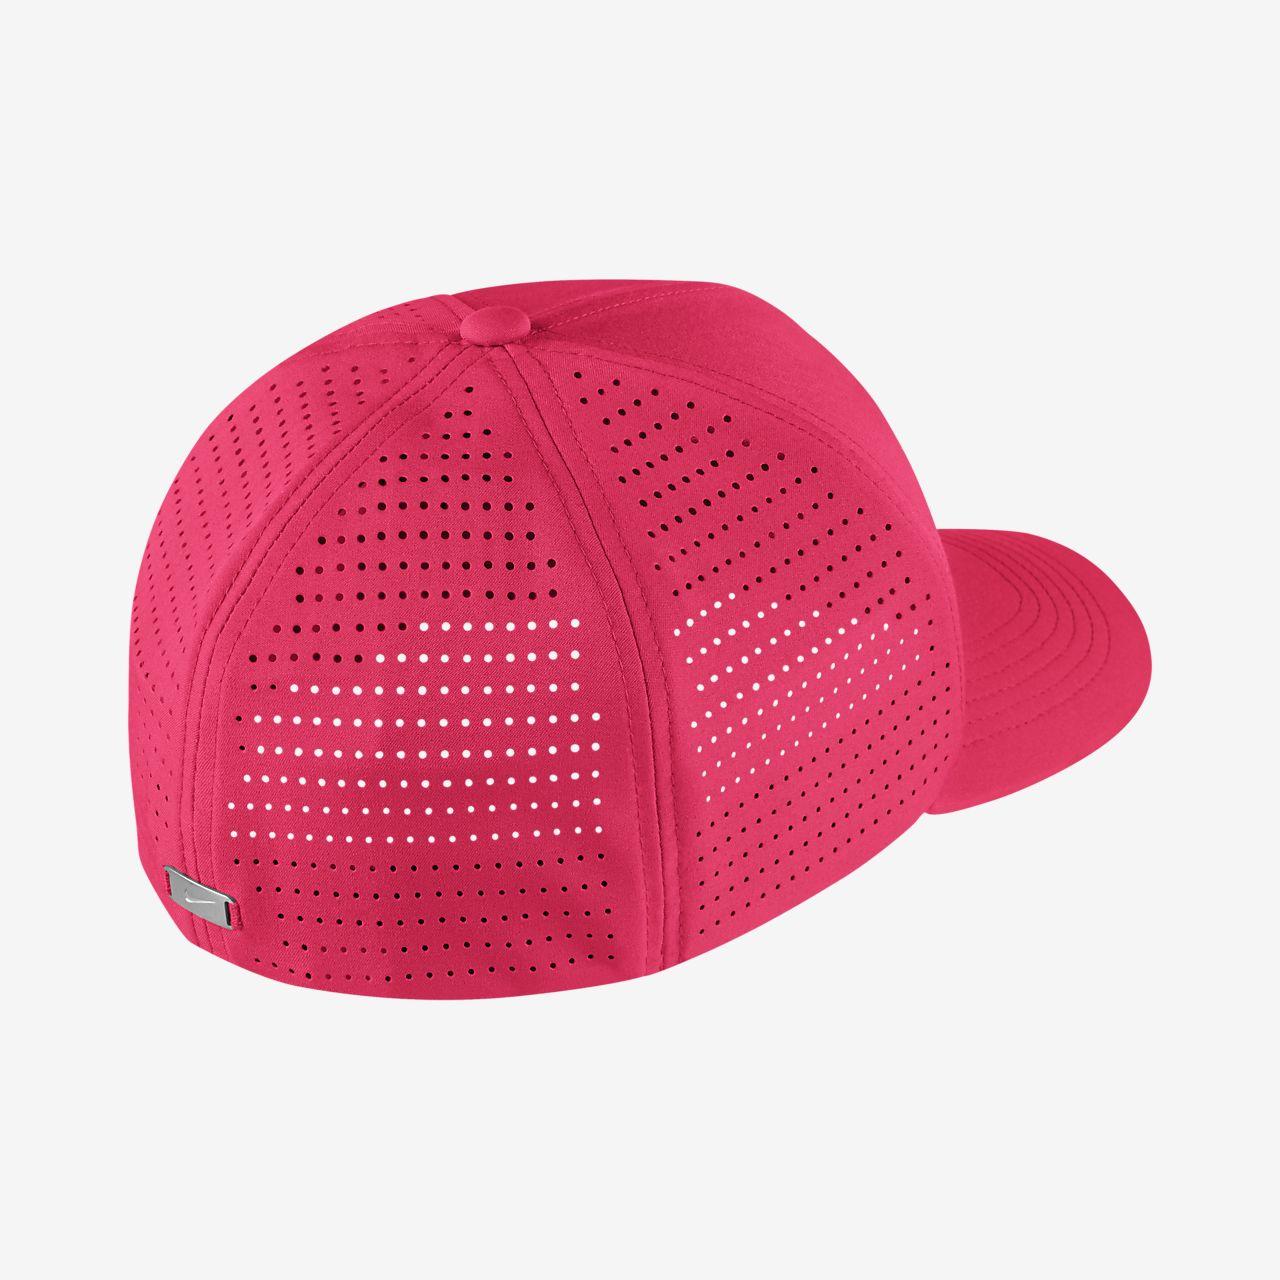 e4222620 Nike AeroBill Classic 99 Fitted Golf Hat. Nike.com MA